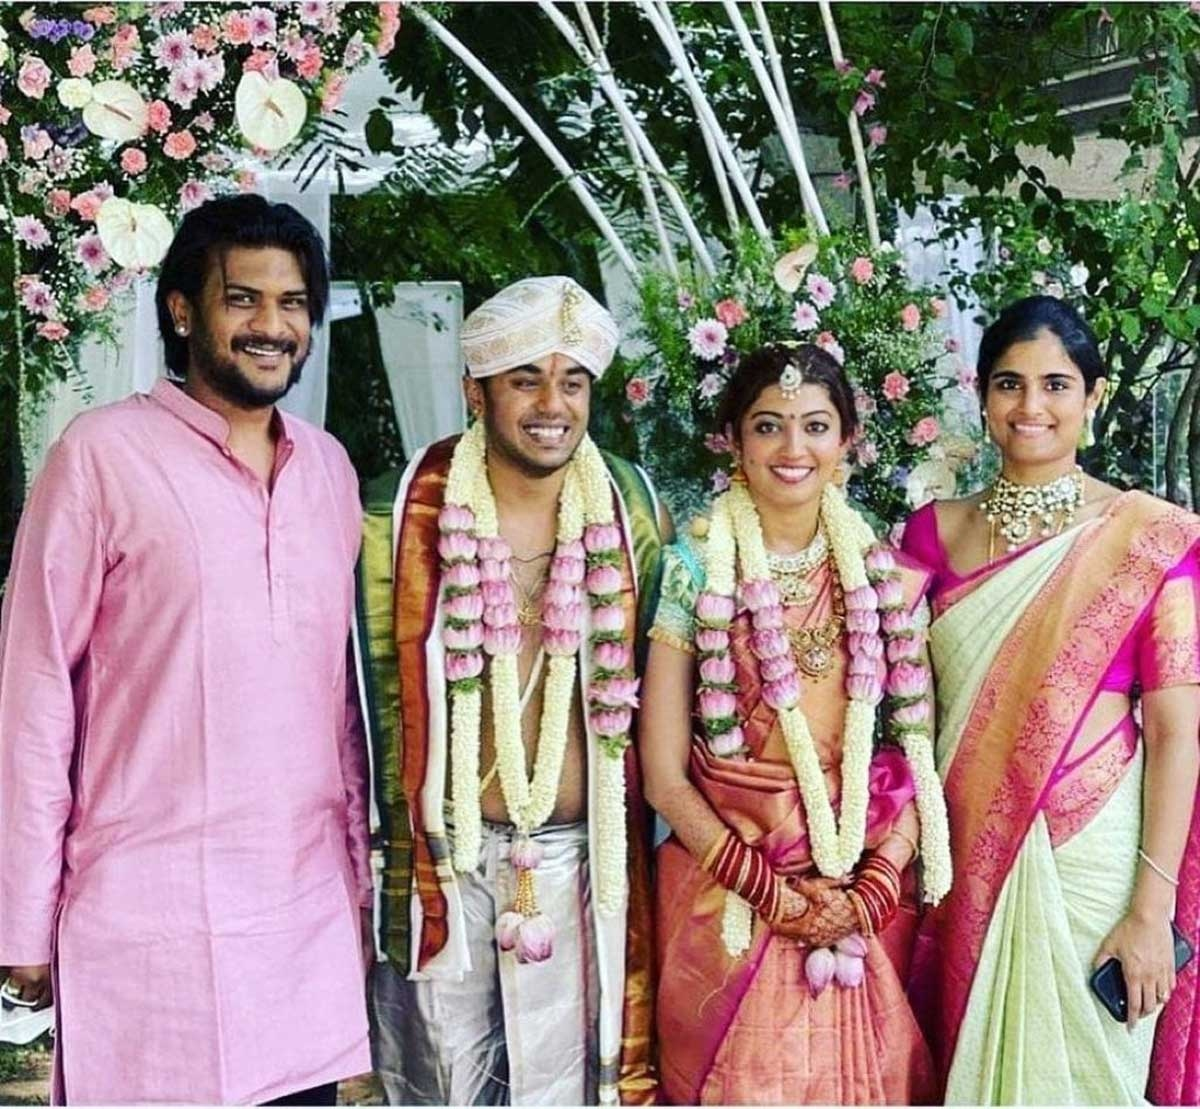 Pranitha Subhash marries businessman Nitin Raju